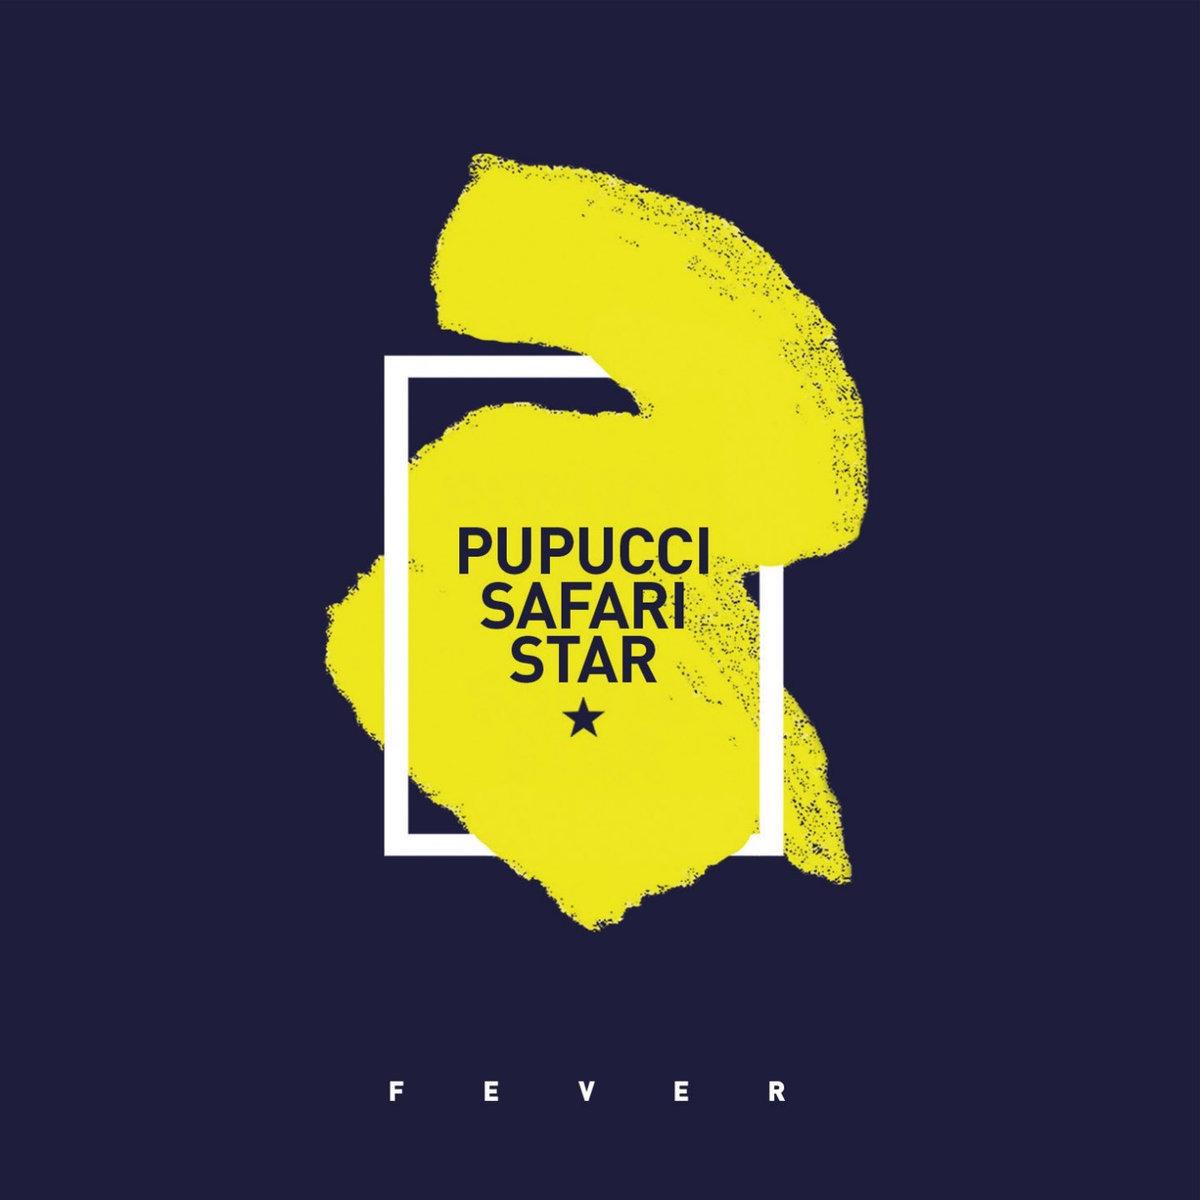 Rockstar Pupucci Safari Star